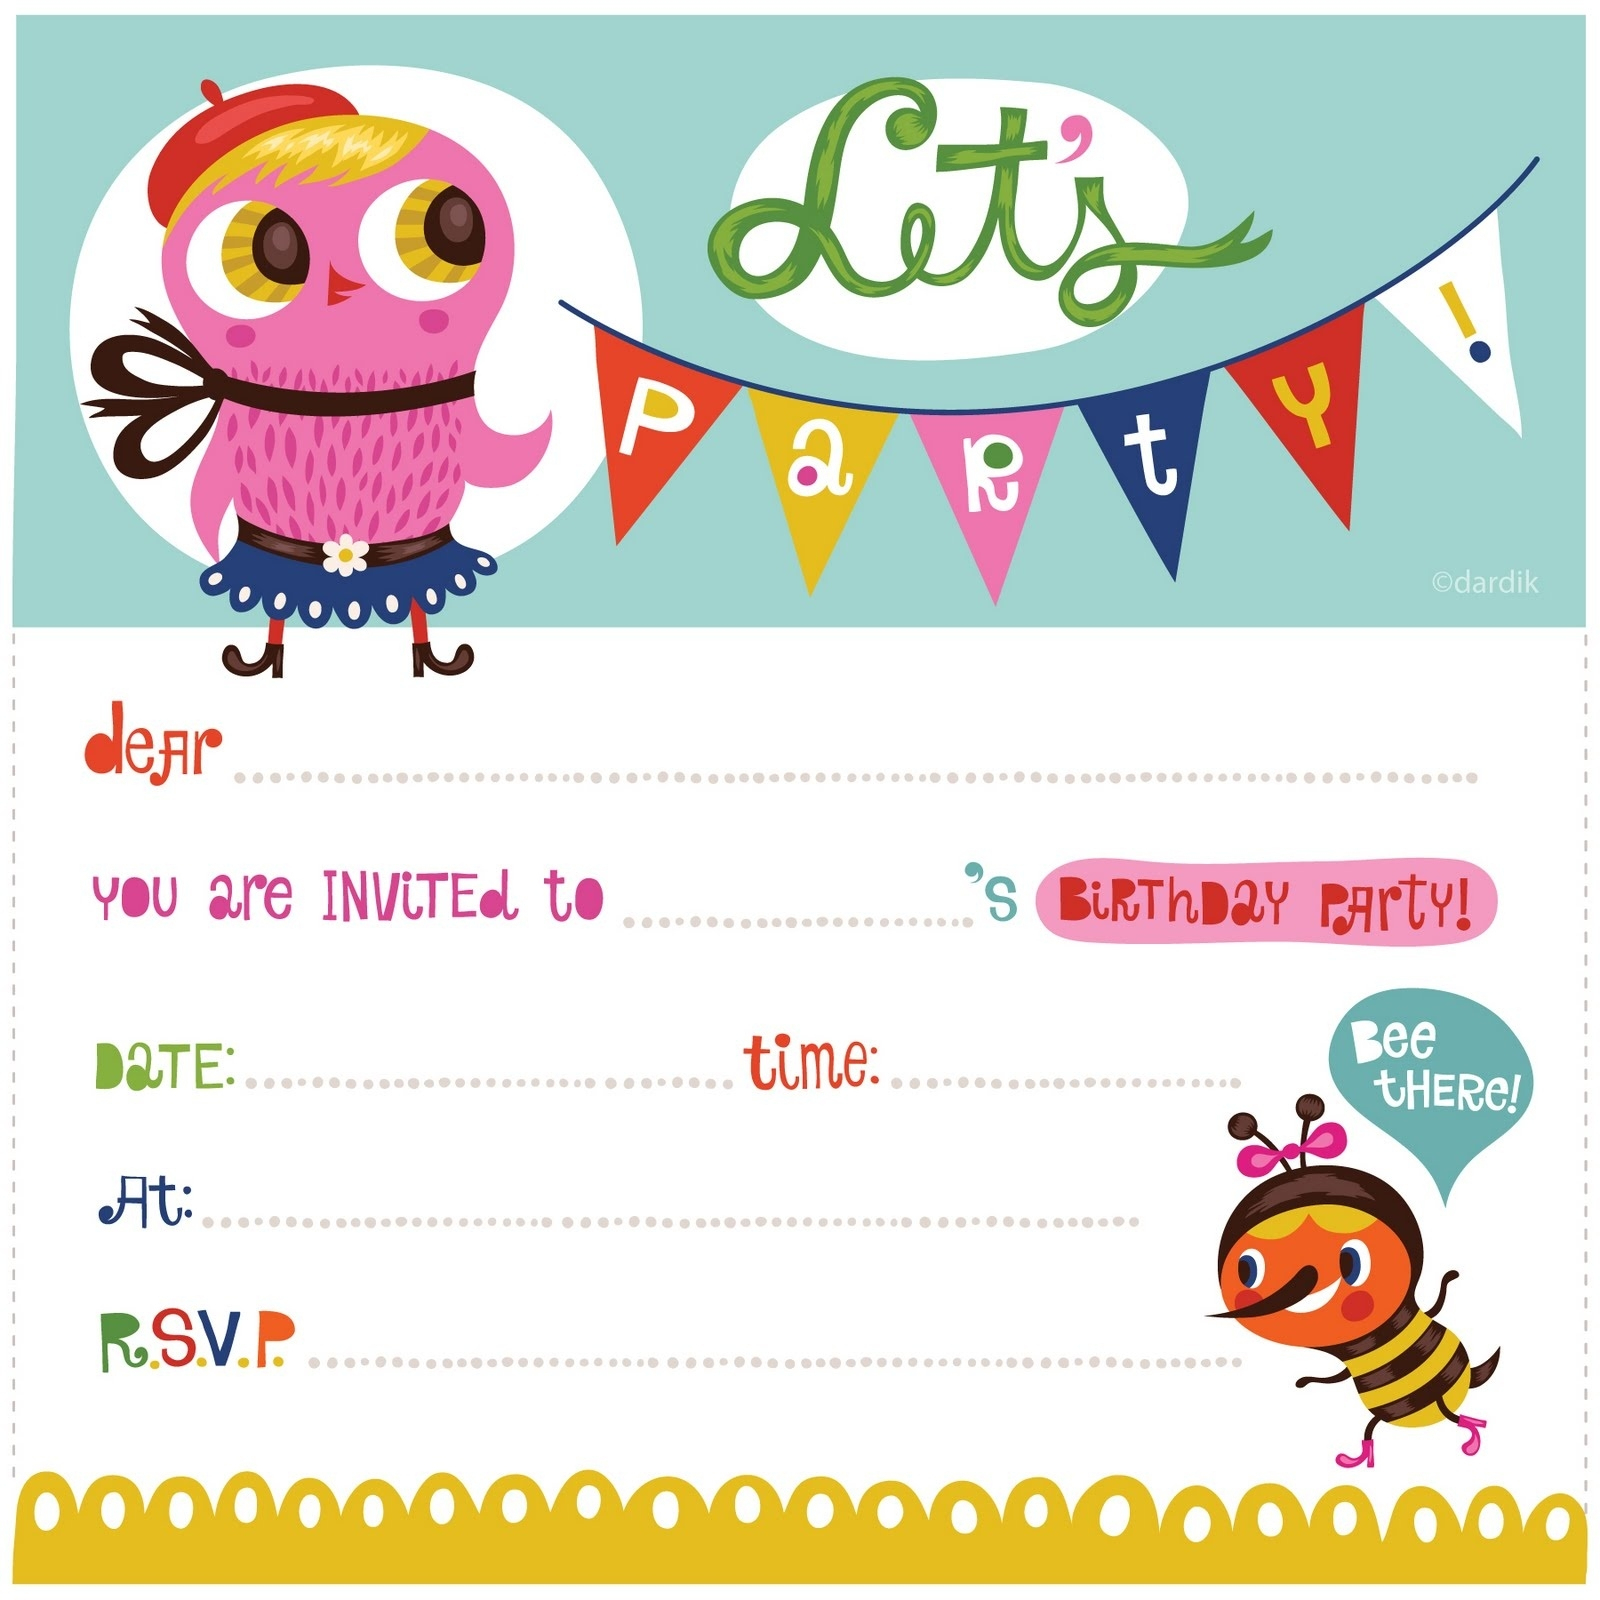 Birthday Invitation Card Template Printable | World Of Label - Free Printable Birthday Invitation Cards Templates